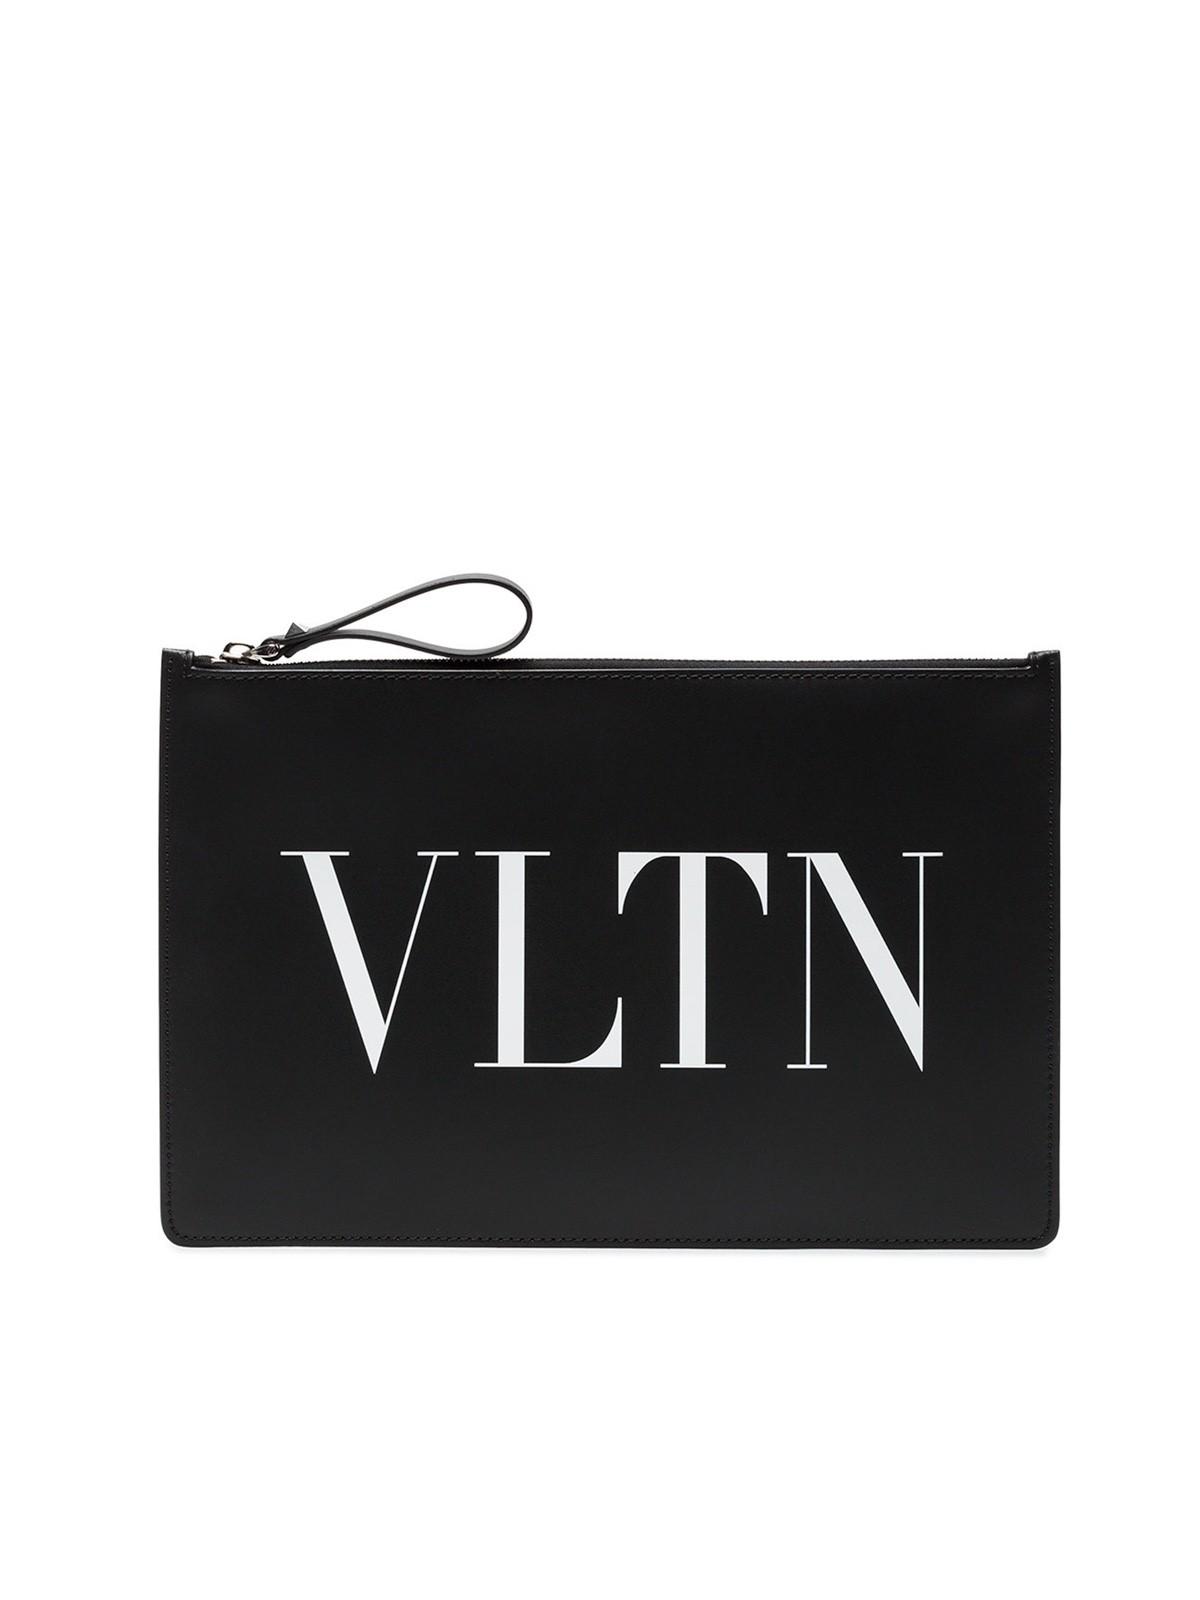 7a70aa2d1 valentino garavani VLTN LOGO CLUTCH available on montiboutique.com ...